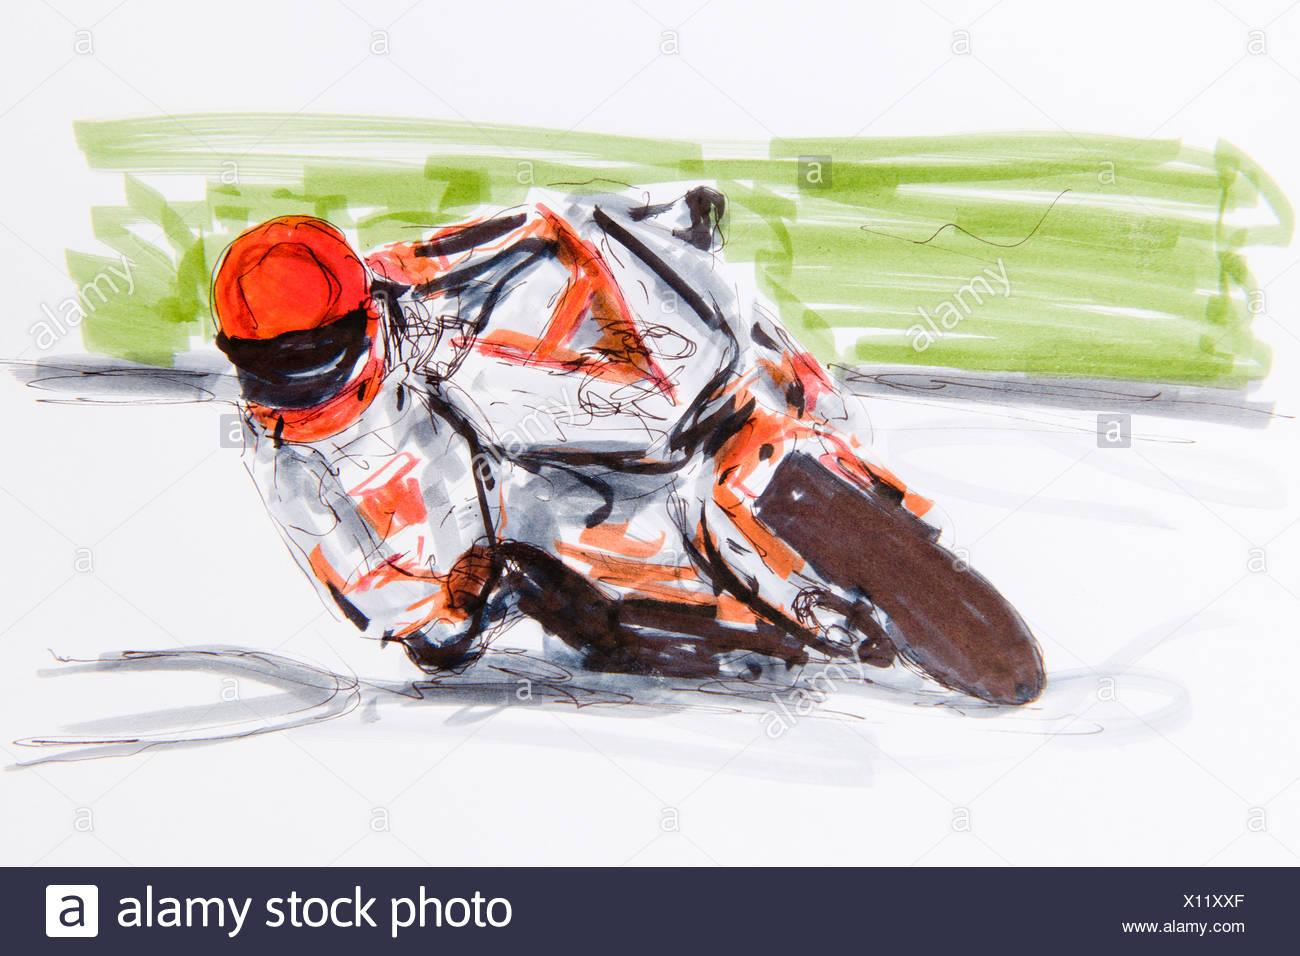 Carrera De Motos Dibujo Del Artista Gerhard Kraus Kriftel